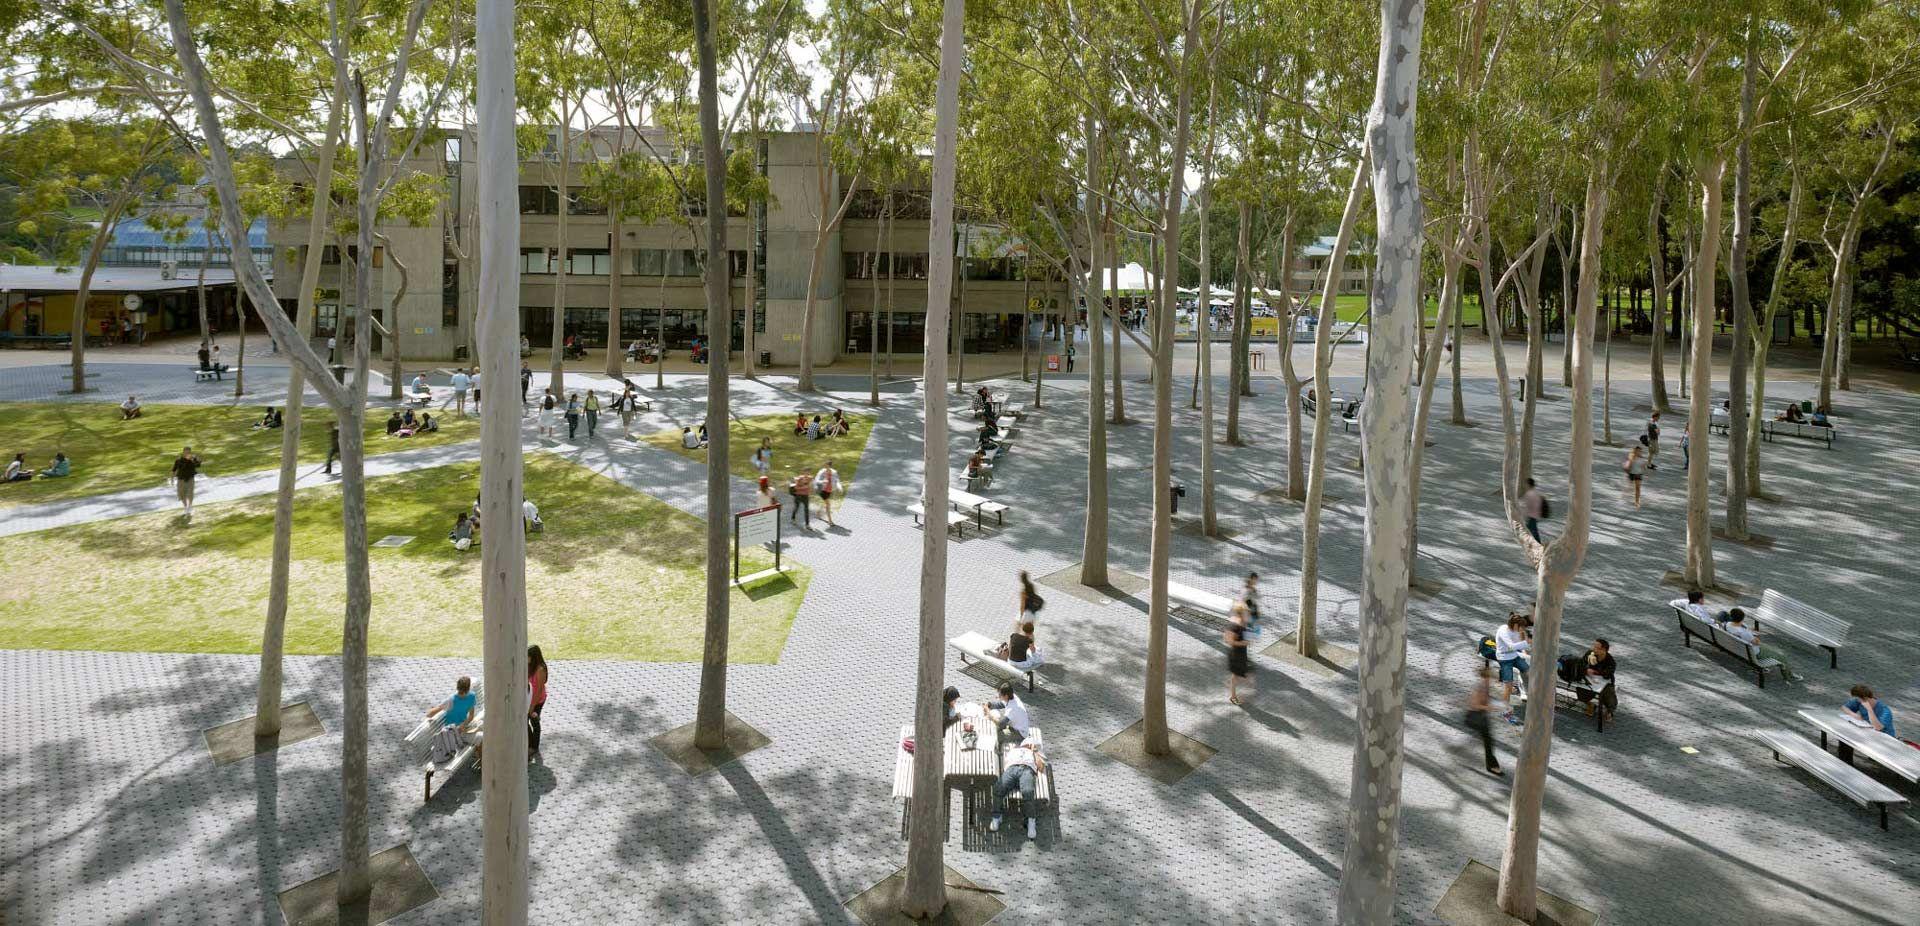 macquarie university courtyard hassell